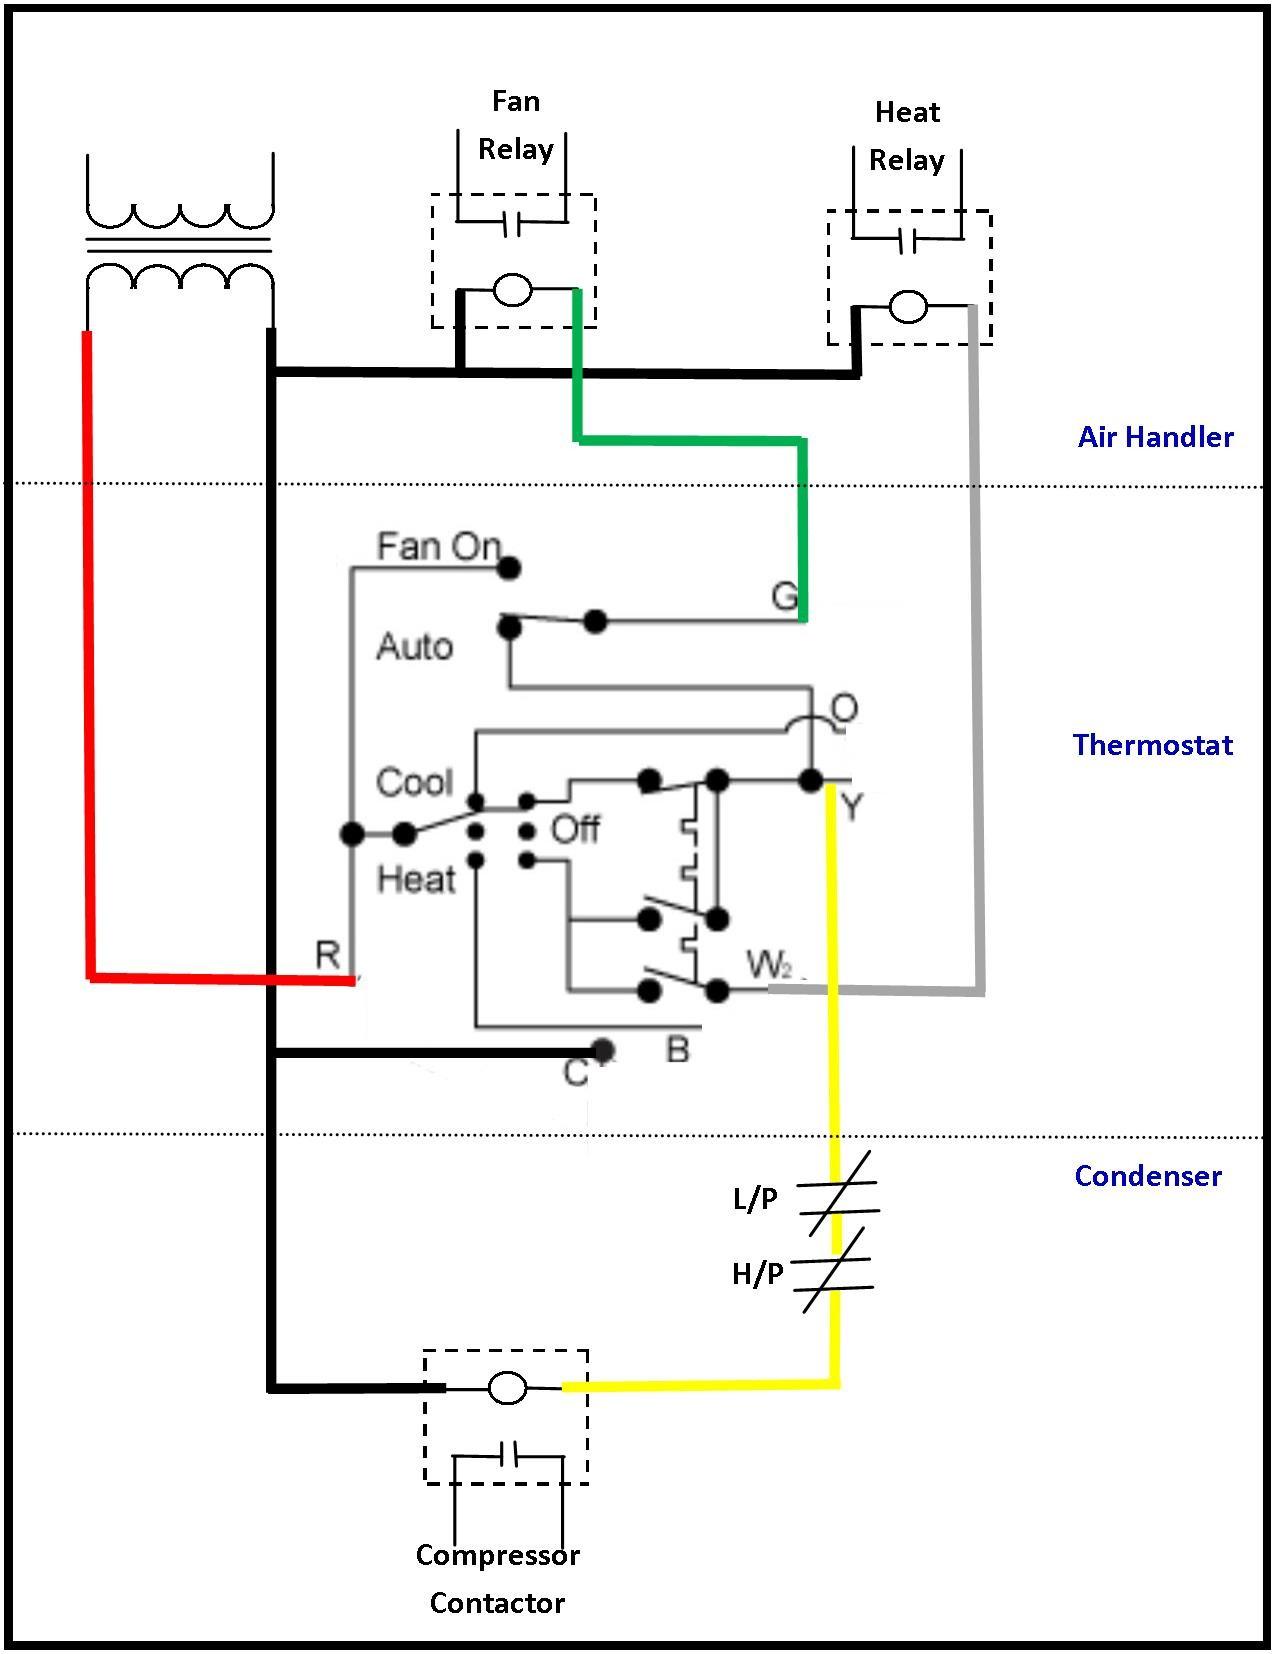 Ac Low Voltage Wiring Diagram Wiring Diagram Besides Low Voltage Wiring Diagrams for Air Handler Of Ac Low Voltage Wiring Diagram